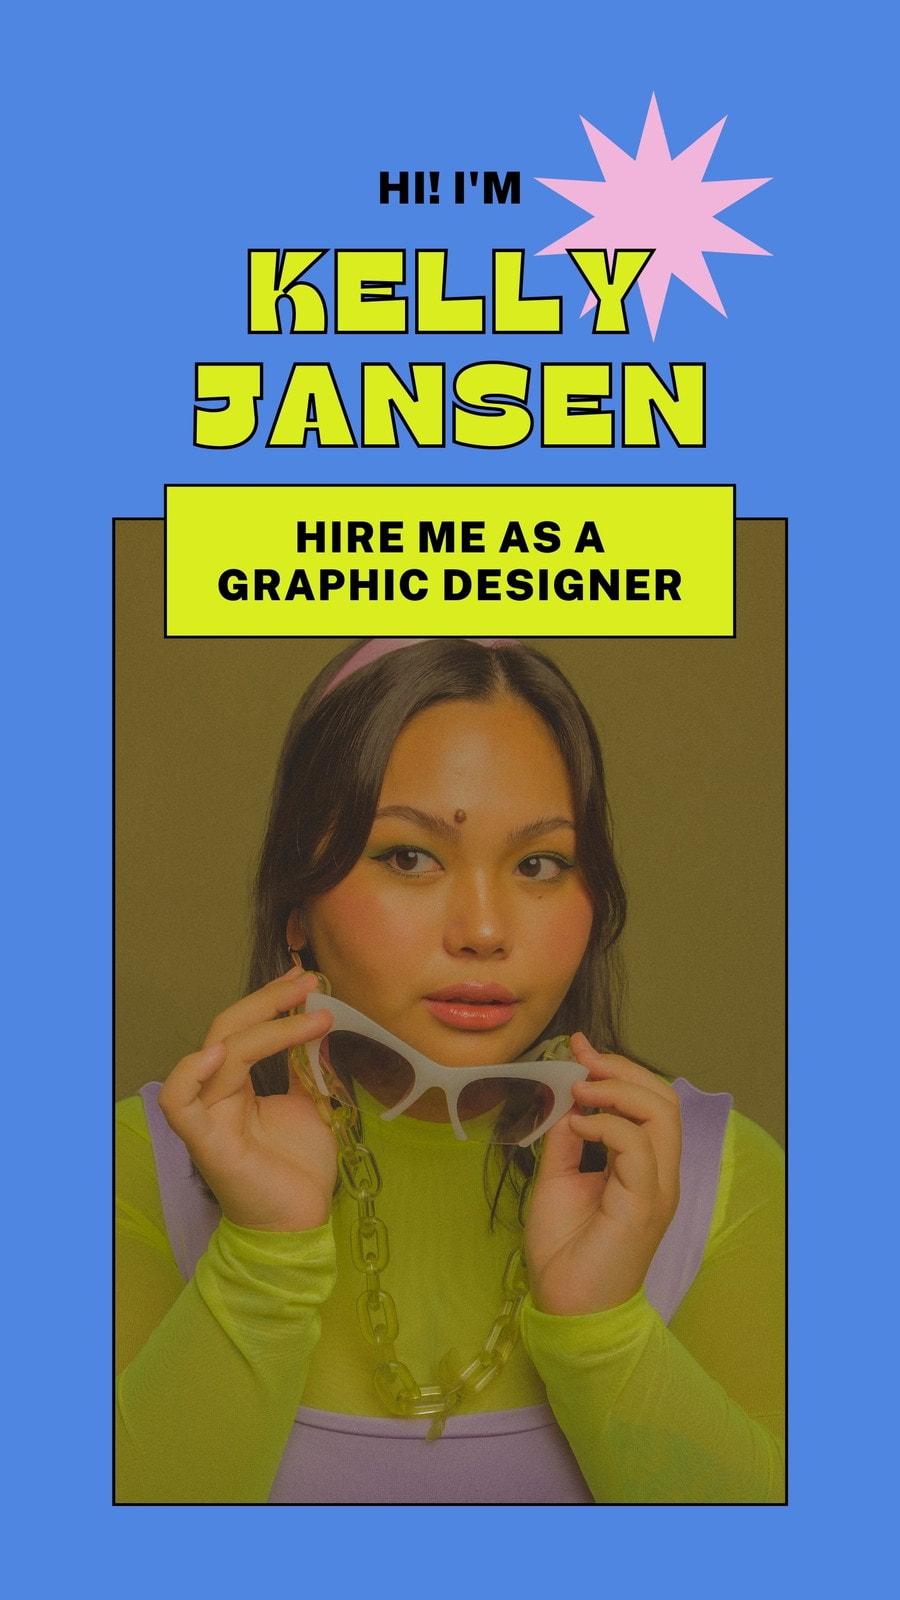 Blue Pink Bright Outline College Graduate Job Seeker Graphic Designer Digital Video Resume Tiktok Video